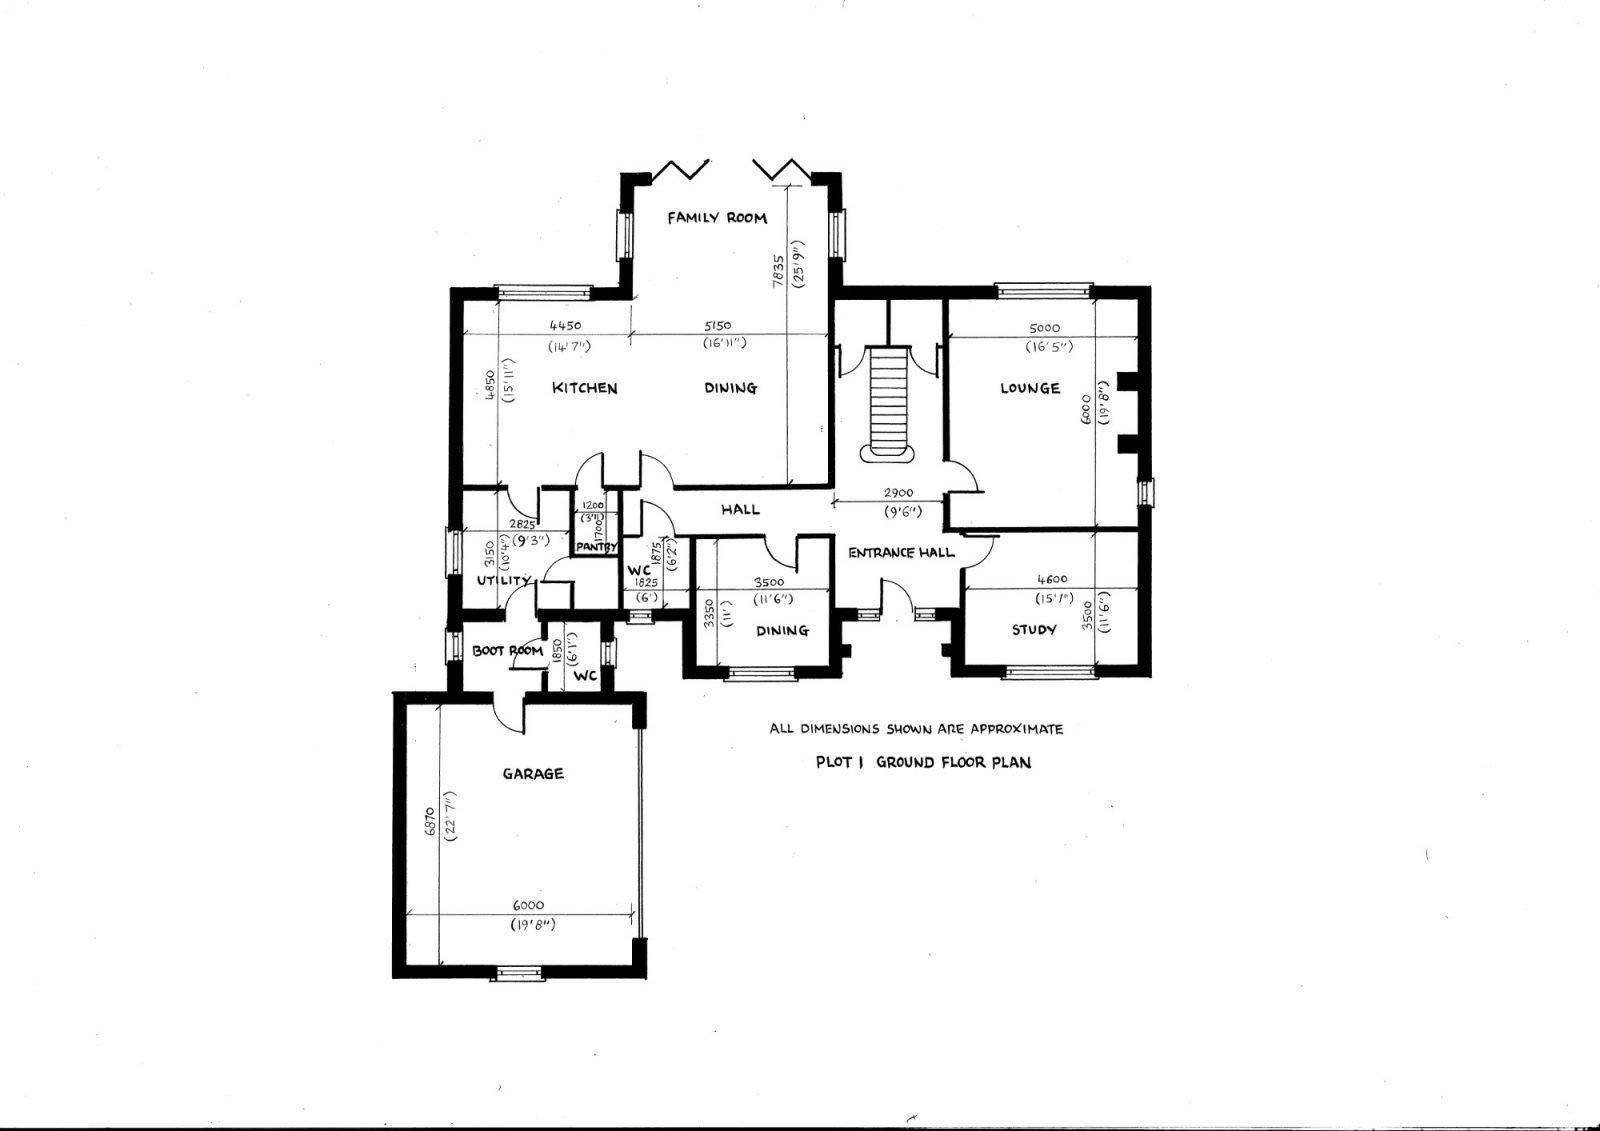 plot-1-rdc-ground-floor-plan